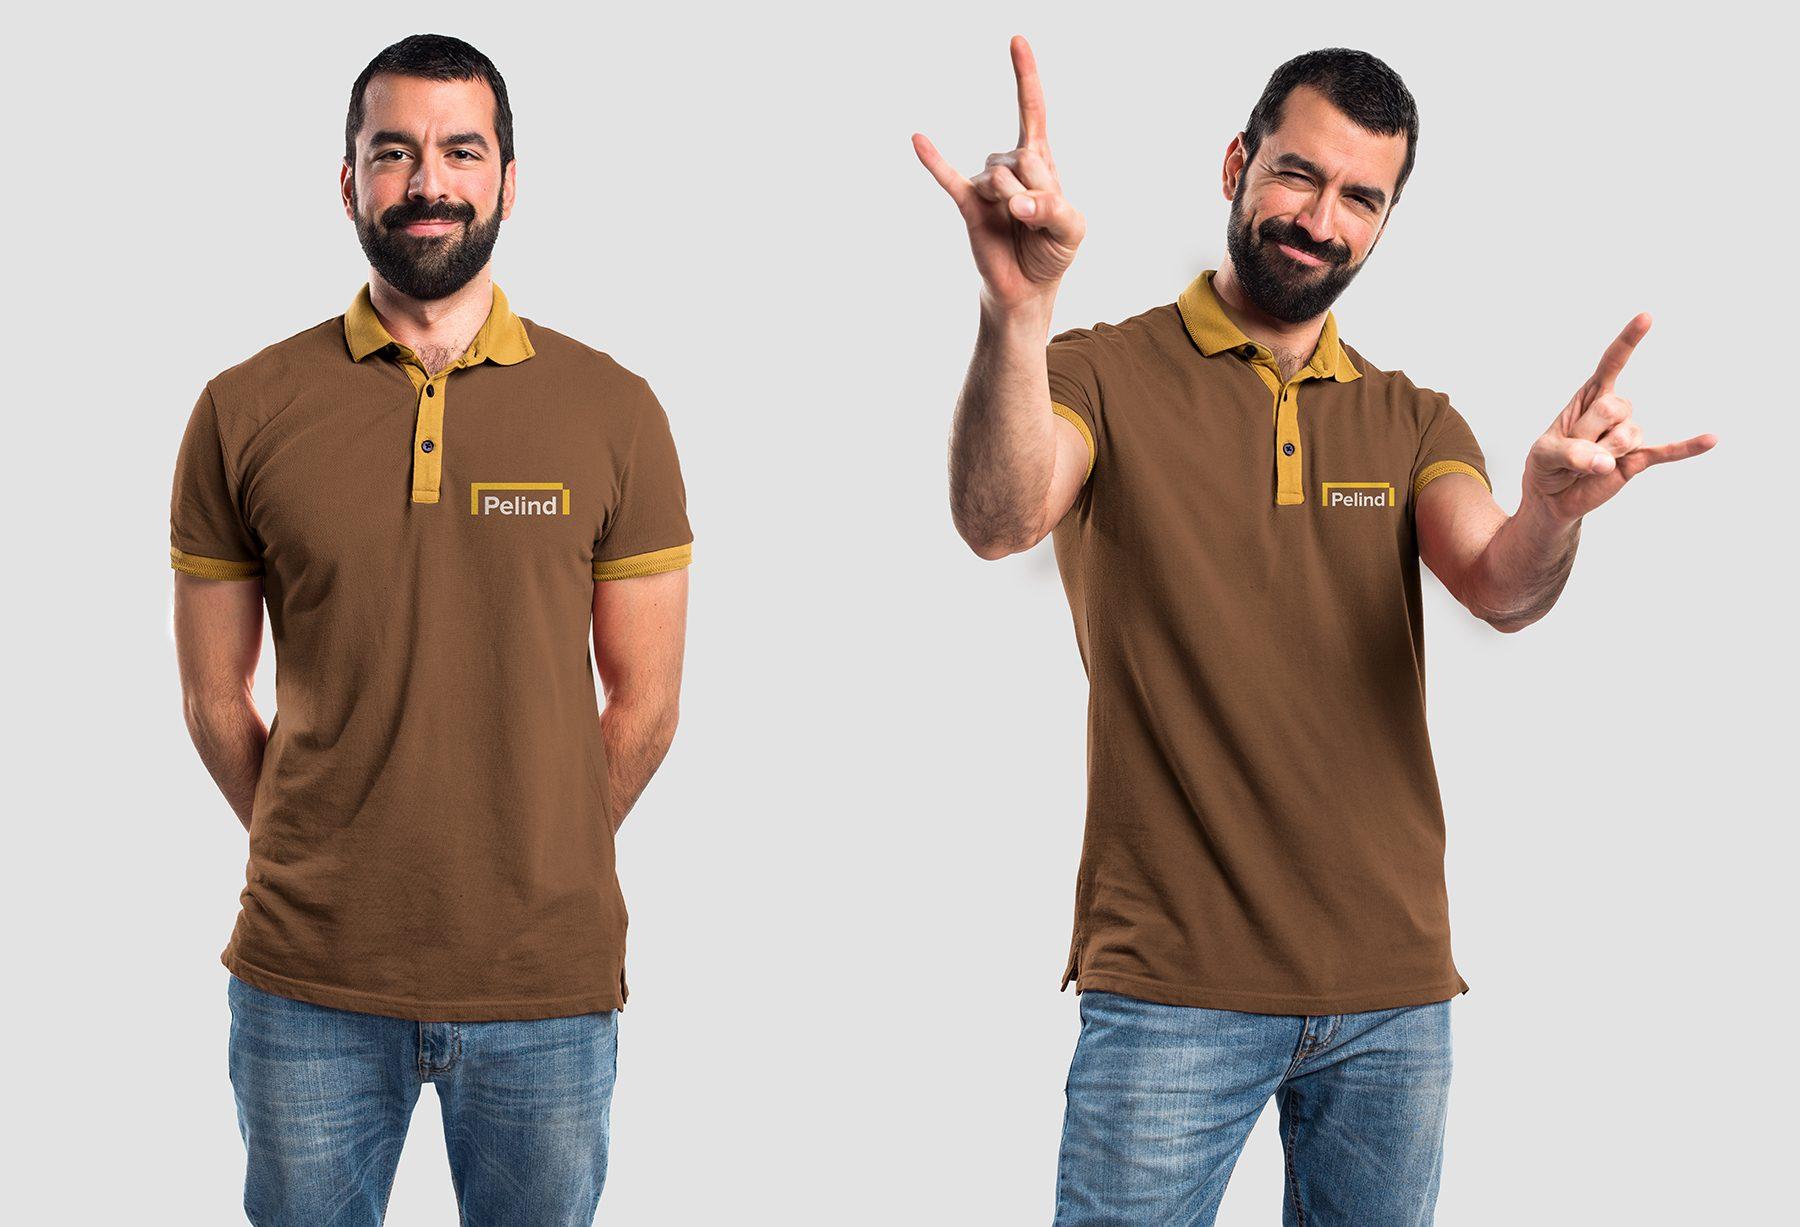 Pelind Employee T-shirt